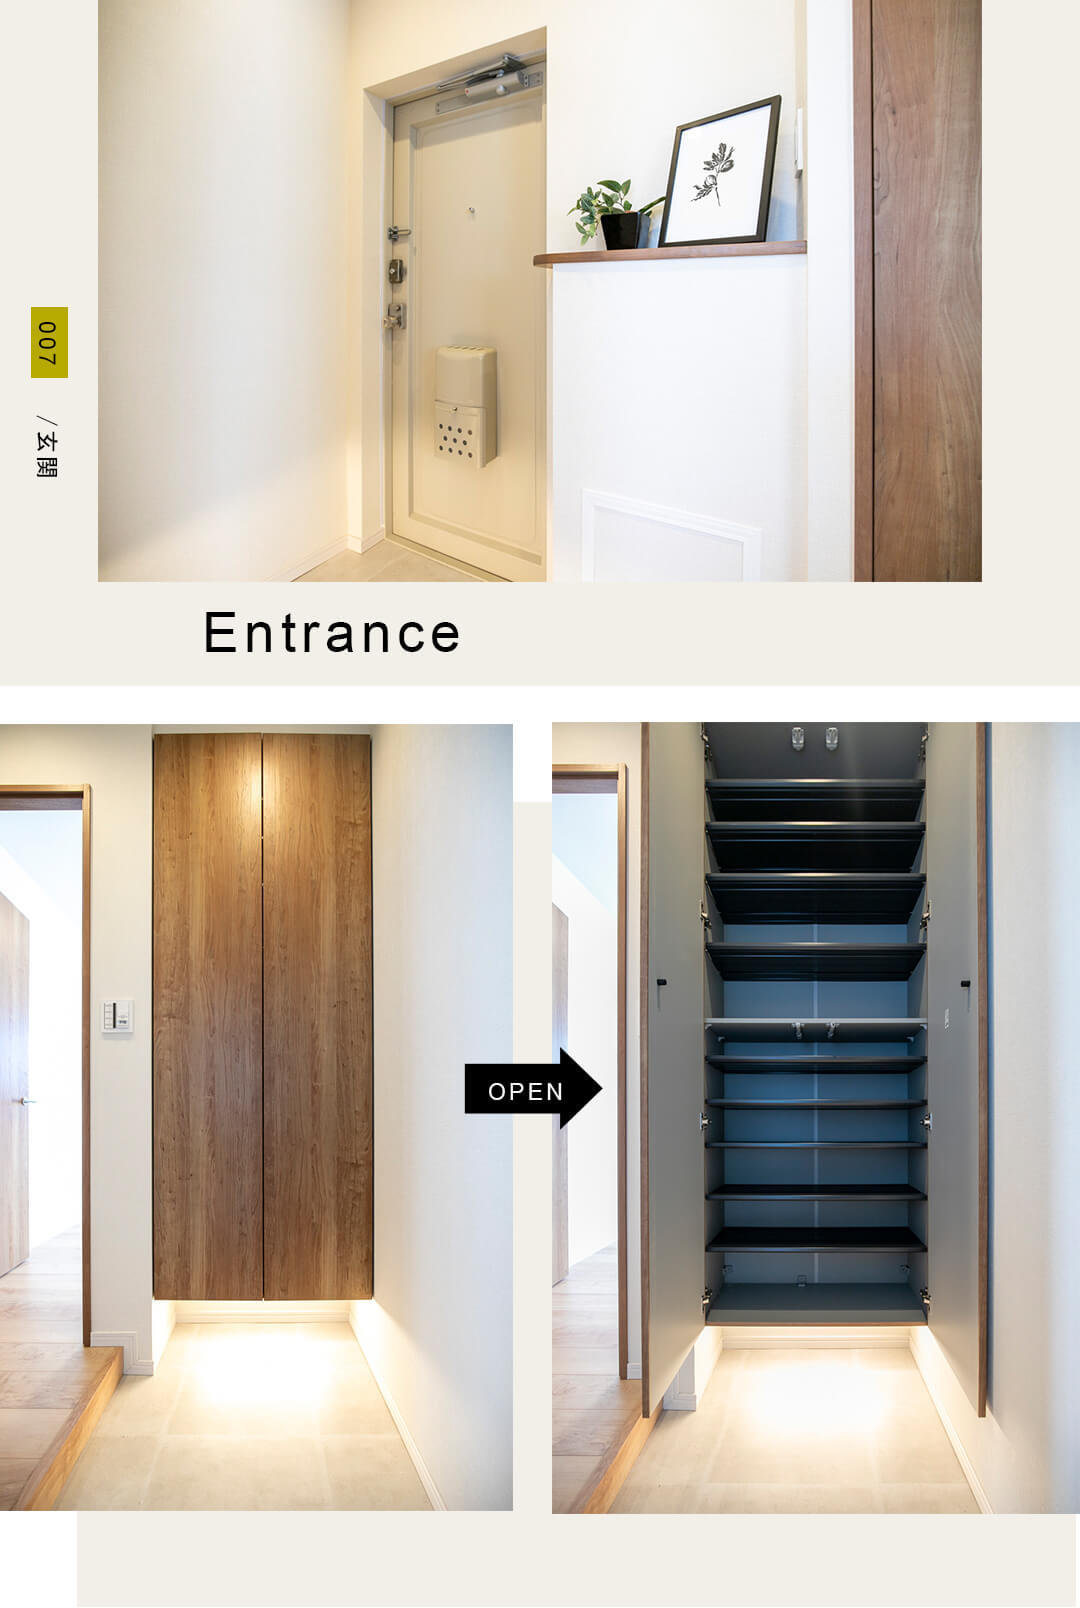 007,Entrance,玄関